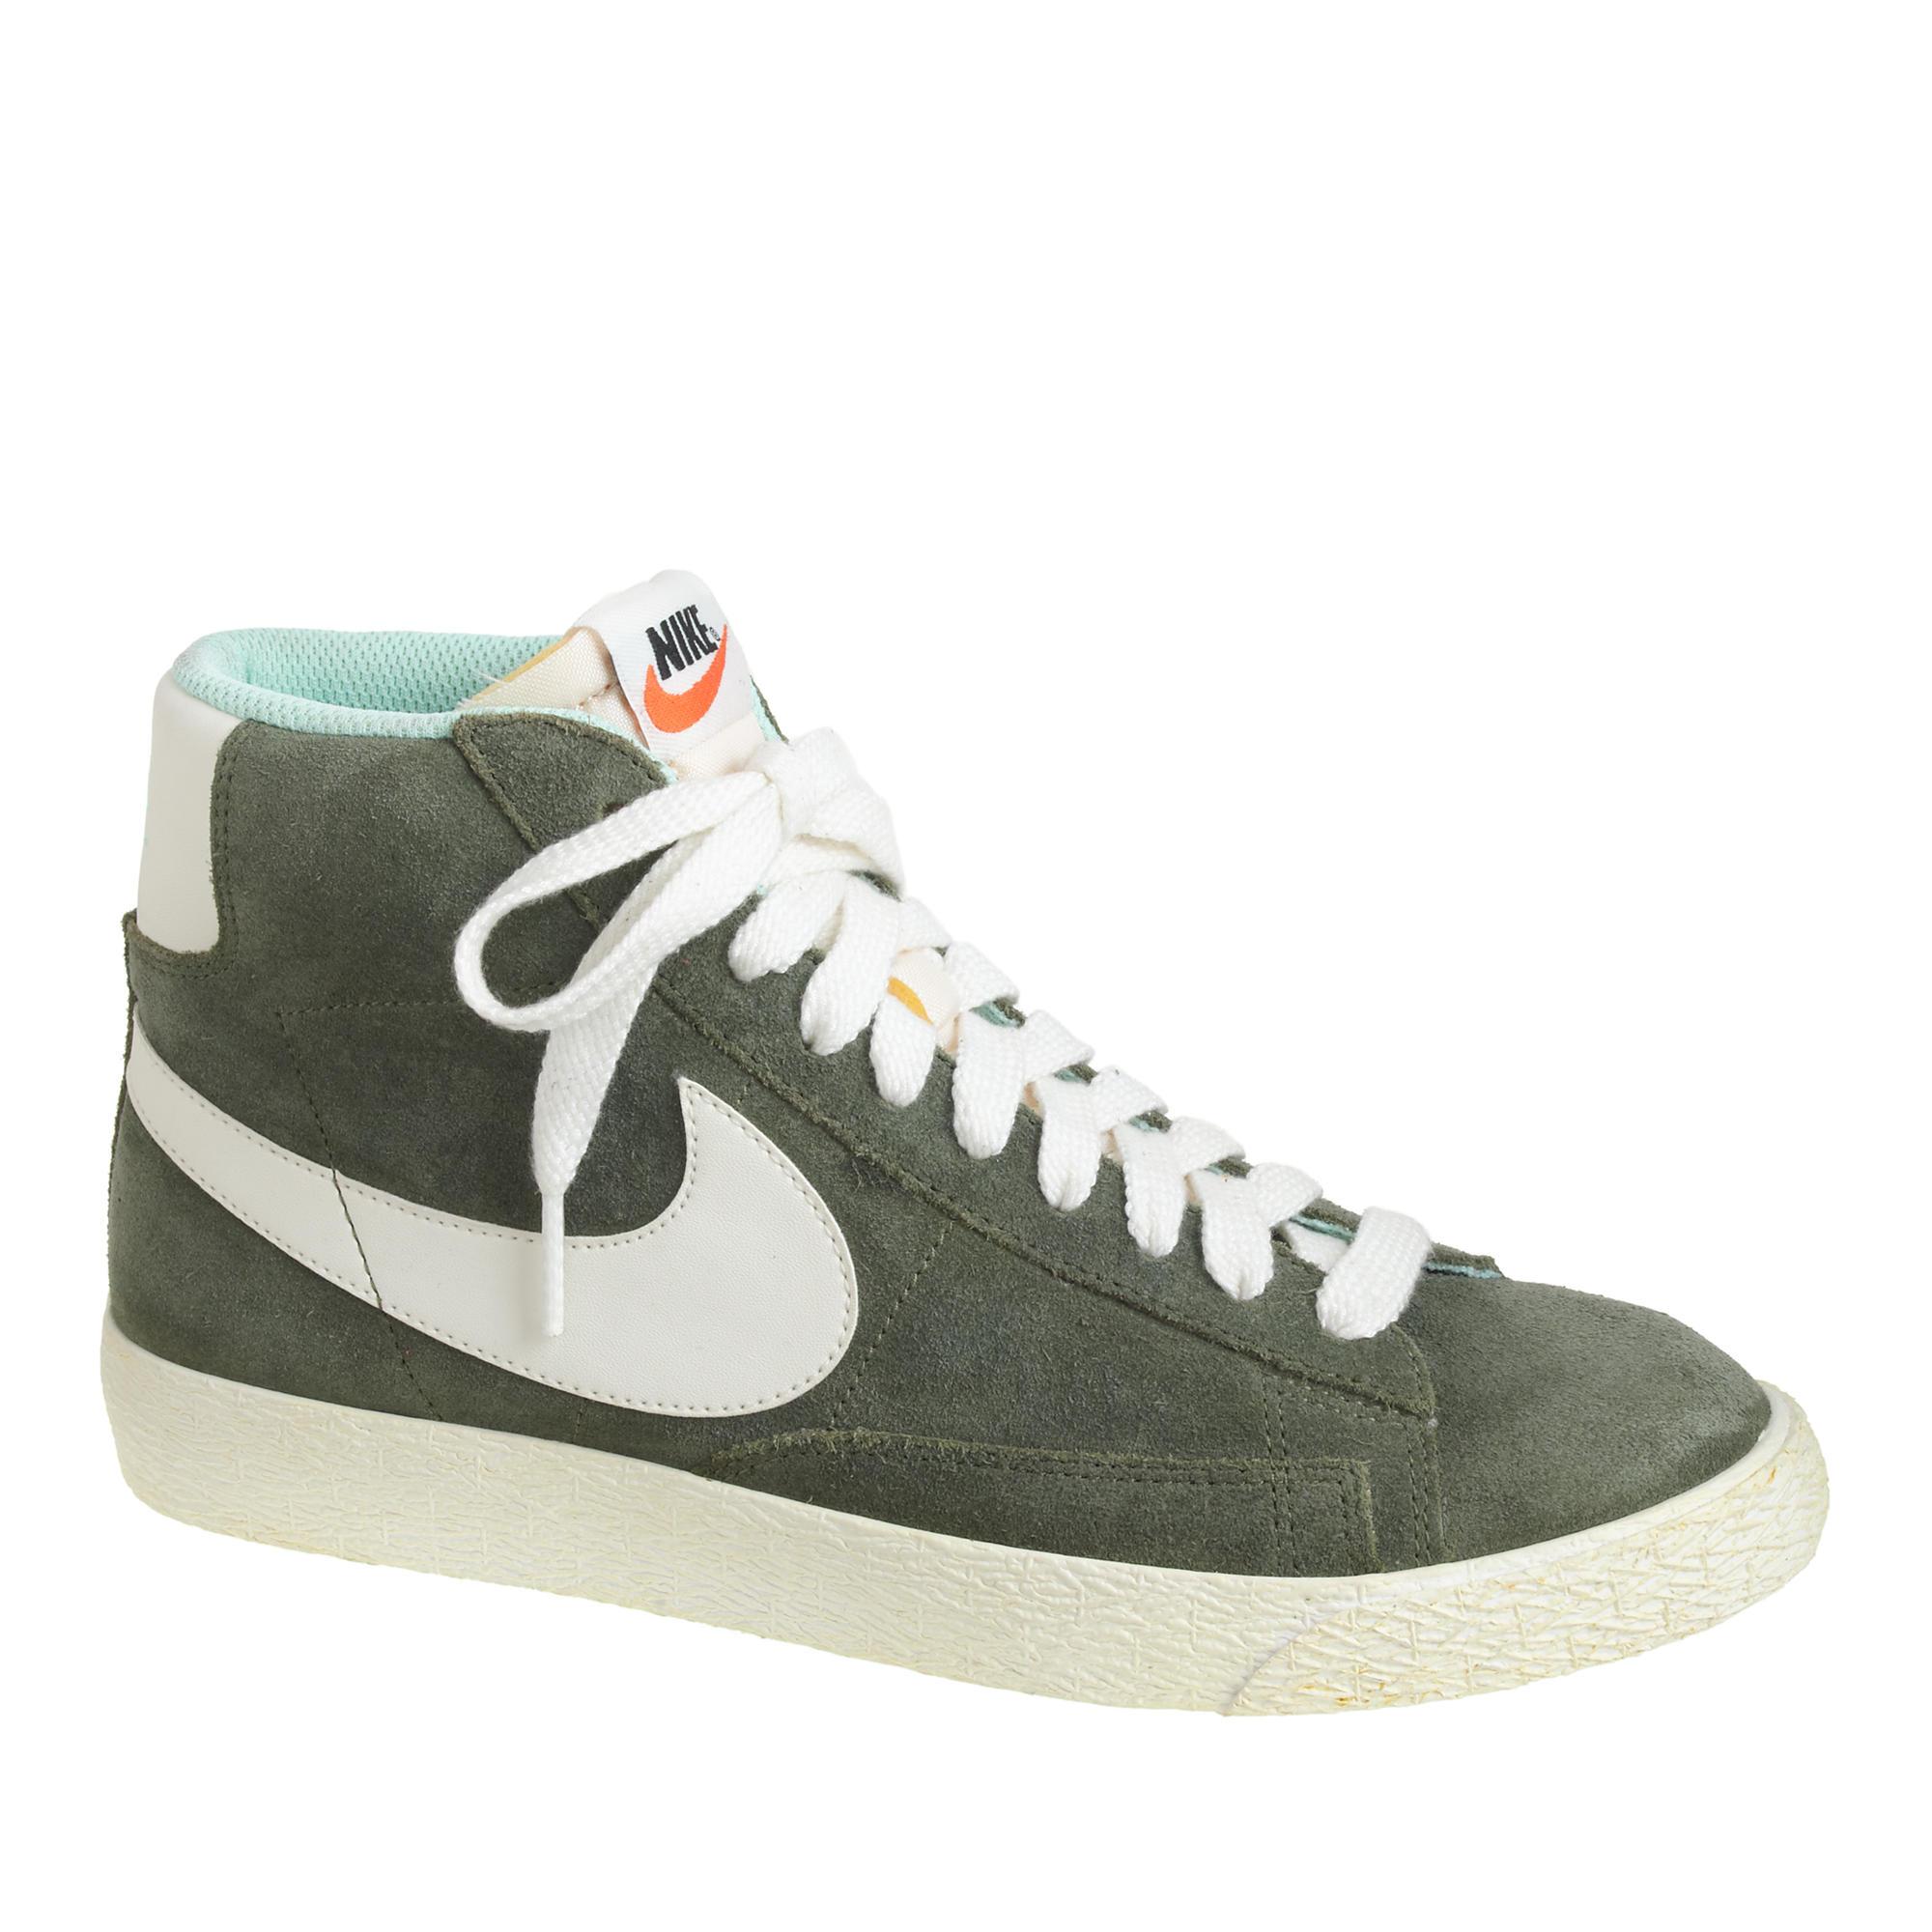 release date 880f5 0057b closeout nike blazer green vintage 766c3 1711b